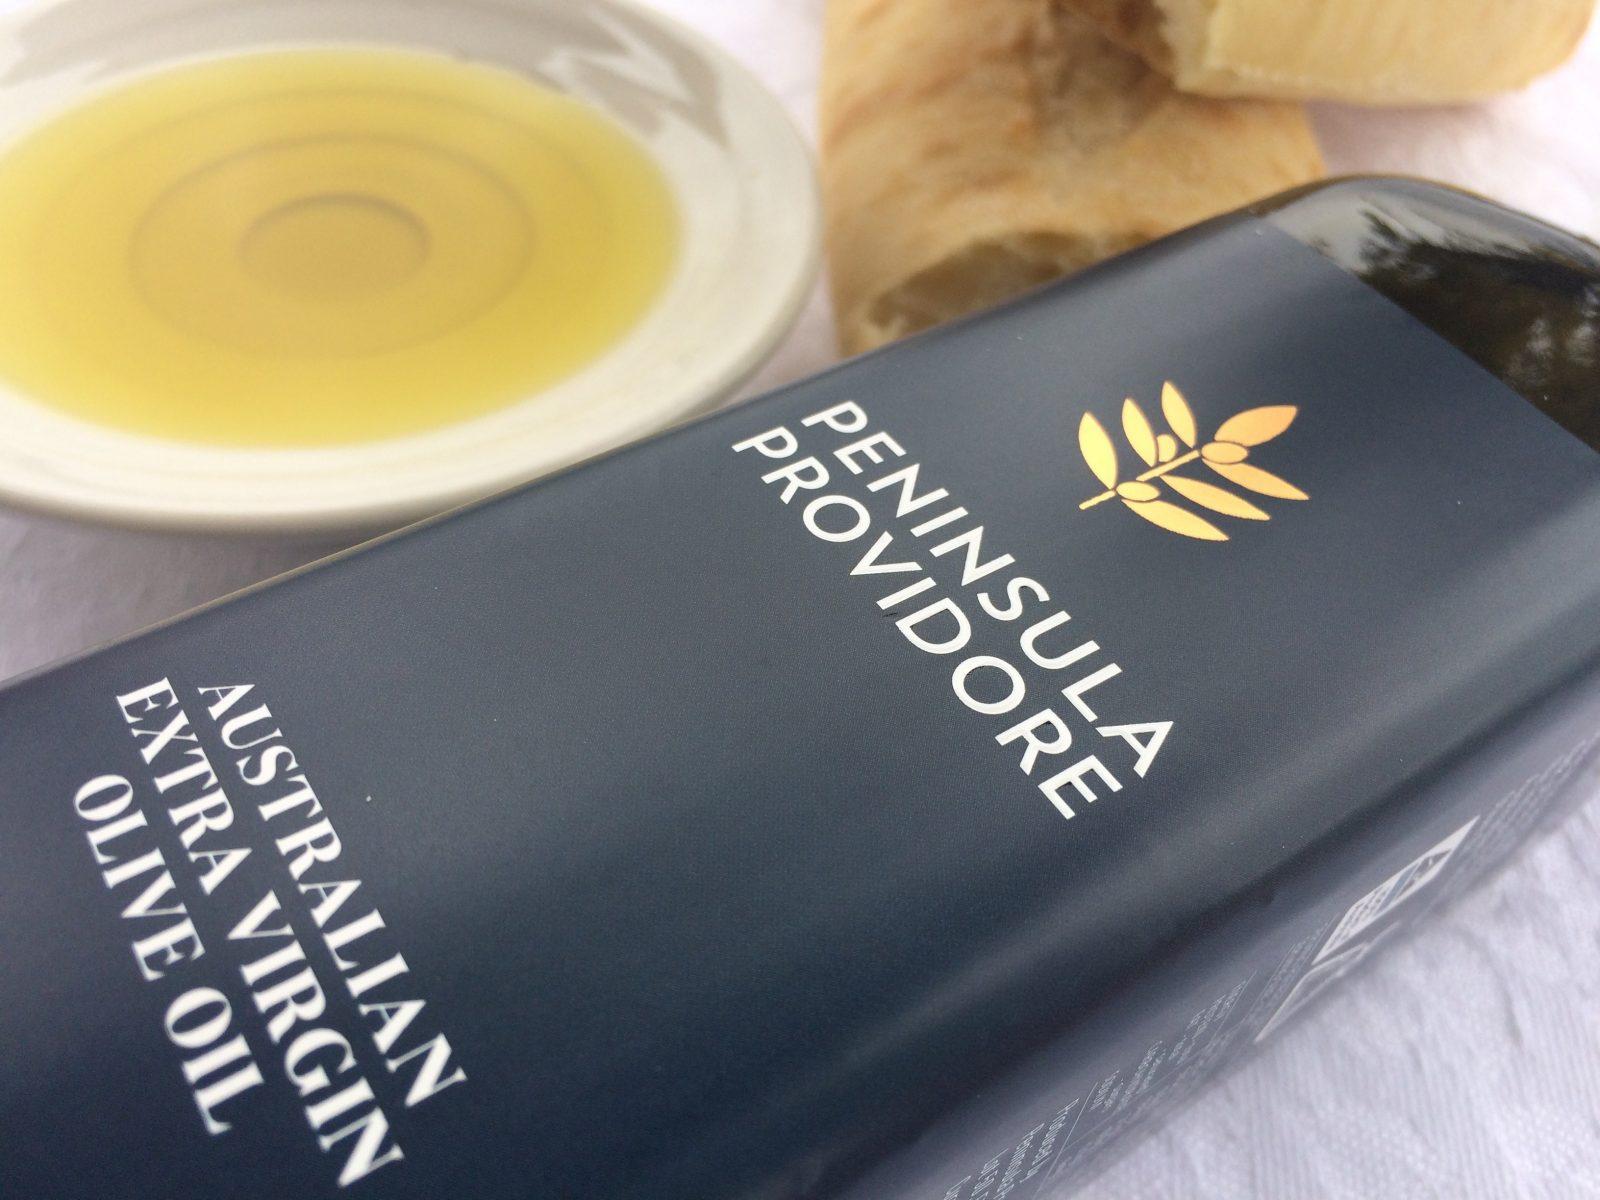 Peninsula Providore, Extra Virgin Olive Oil, Fleurieu Peninsula